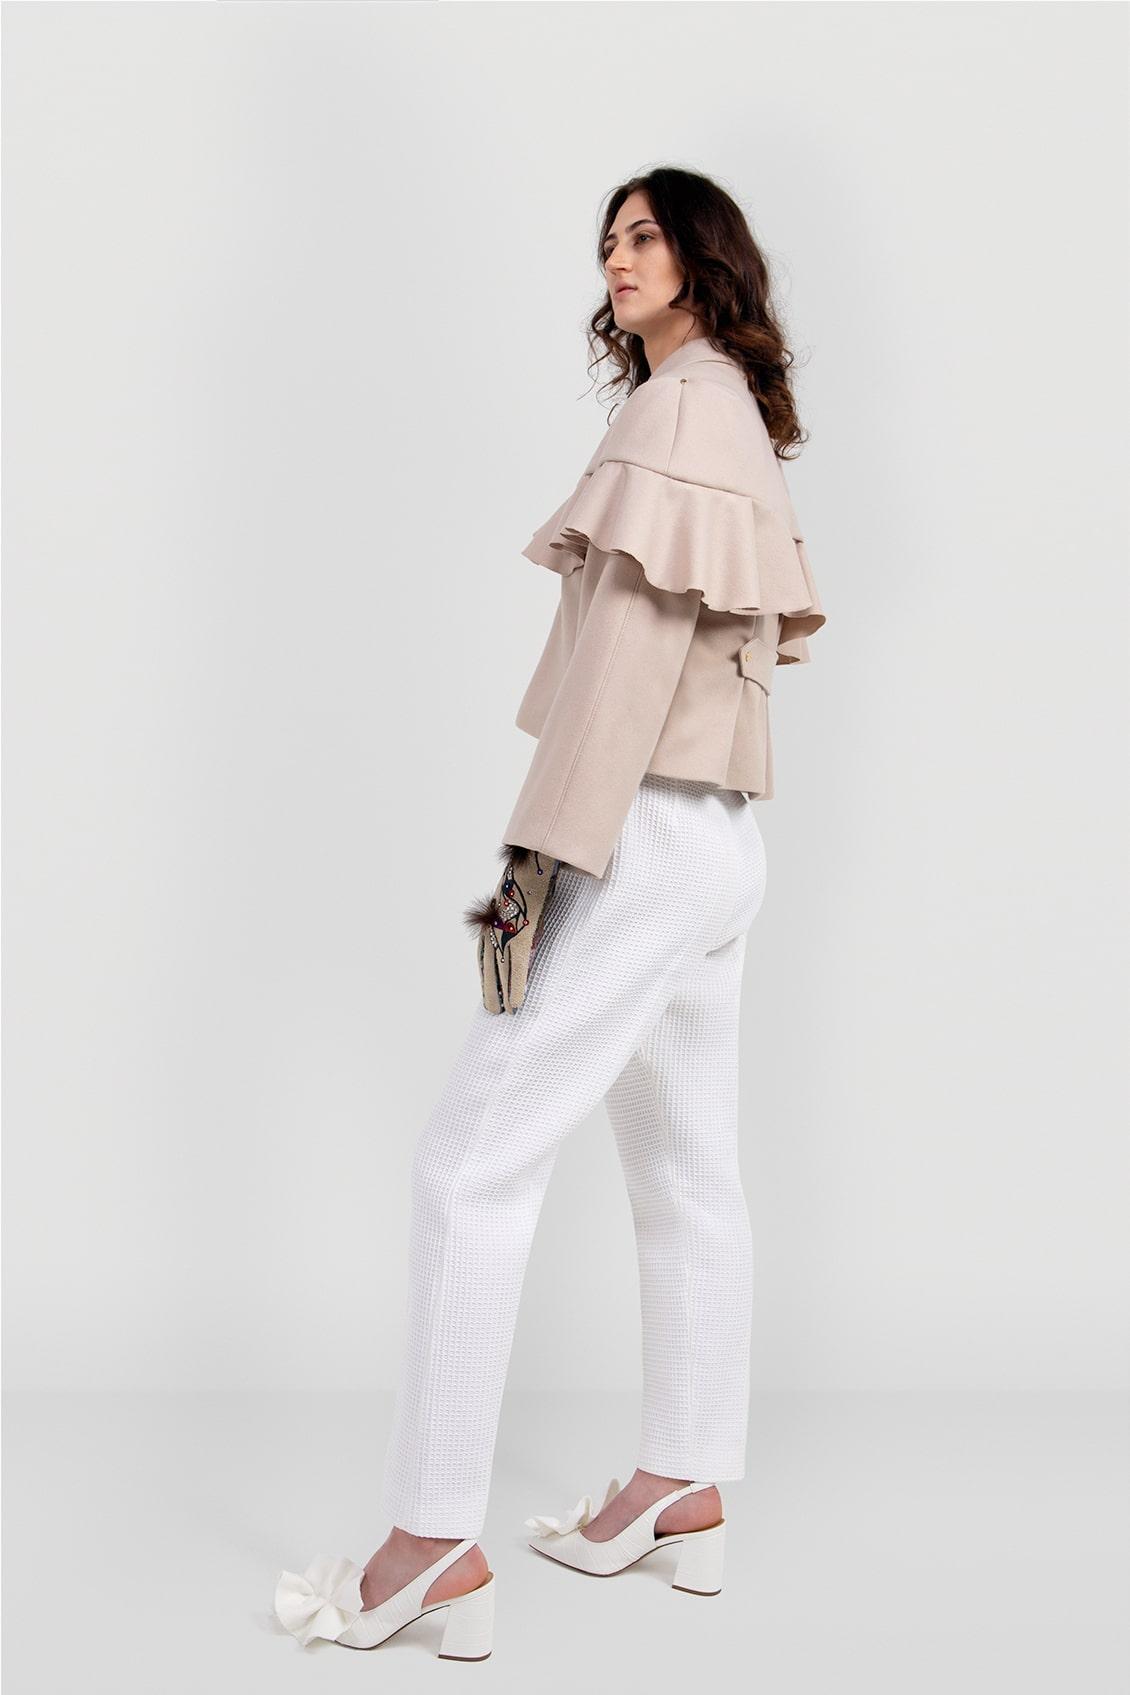 VALDONE Au - side of the beige British wool women's designer coat AUDREY. Hip length coat with detachable cape detail.